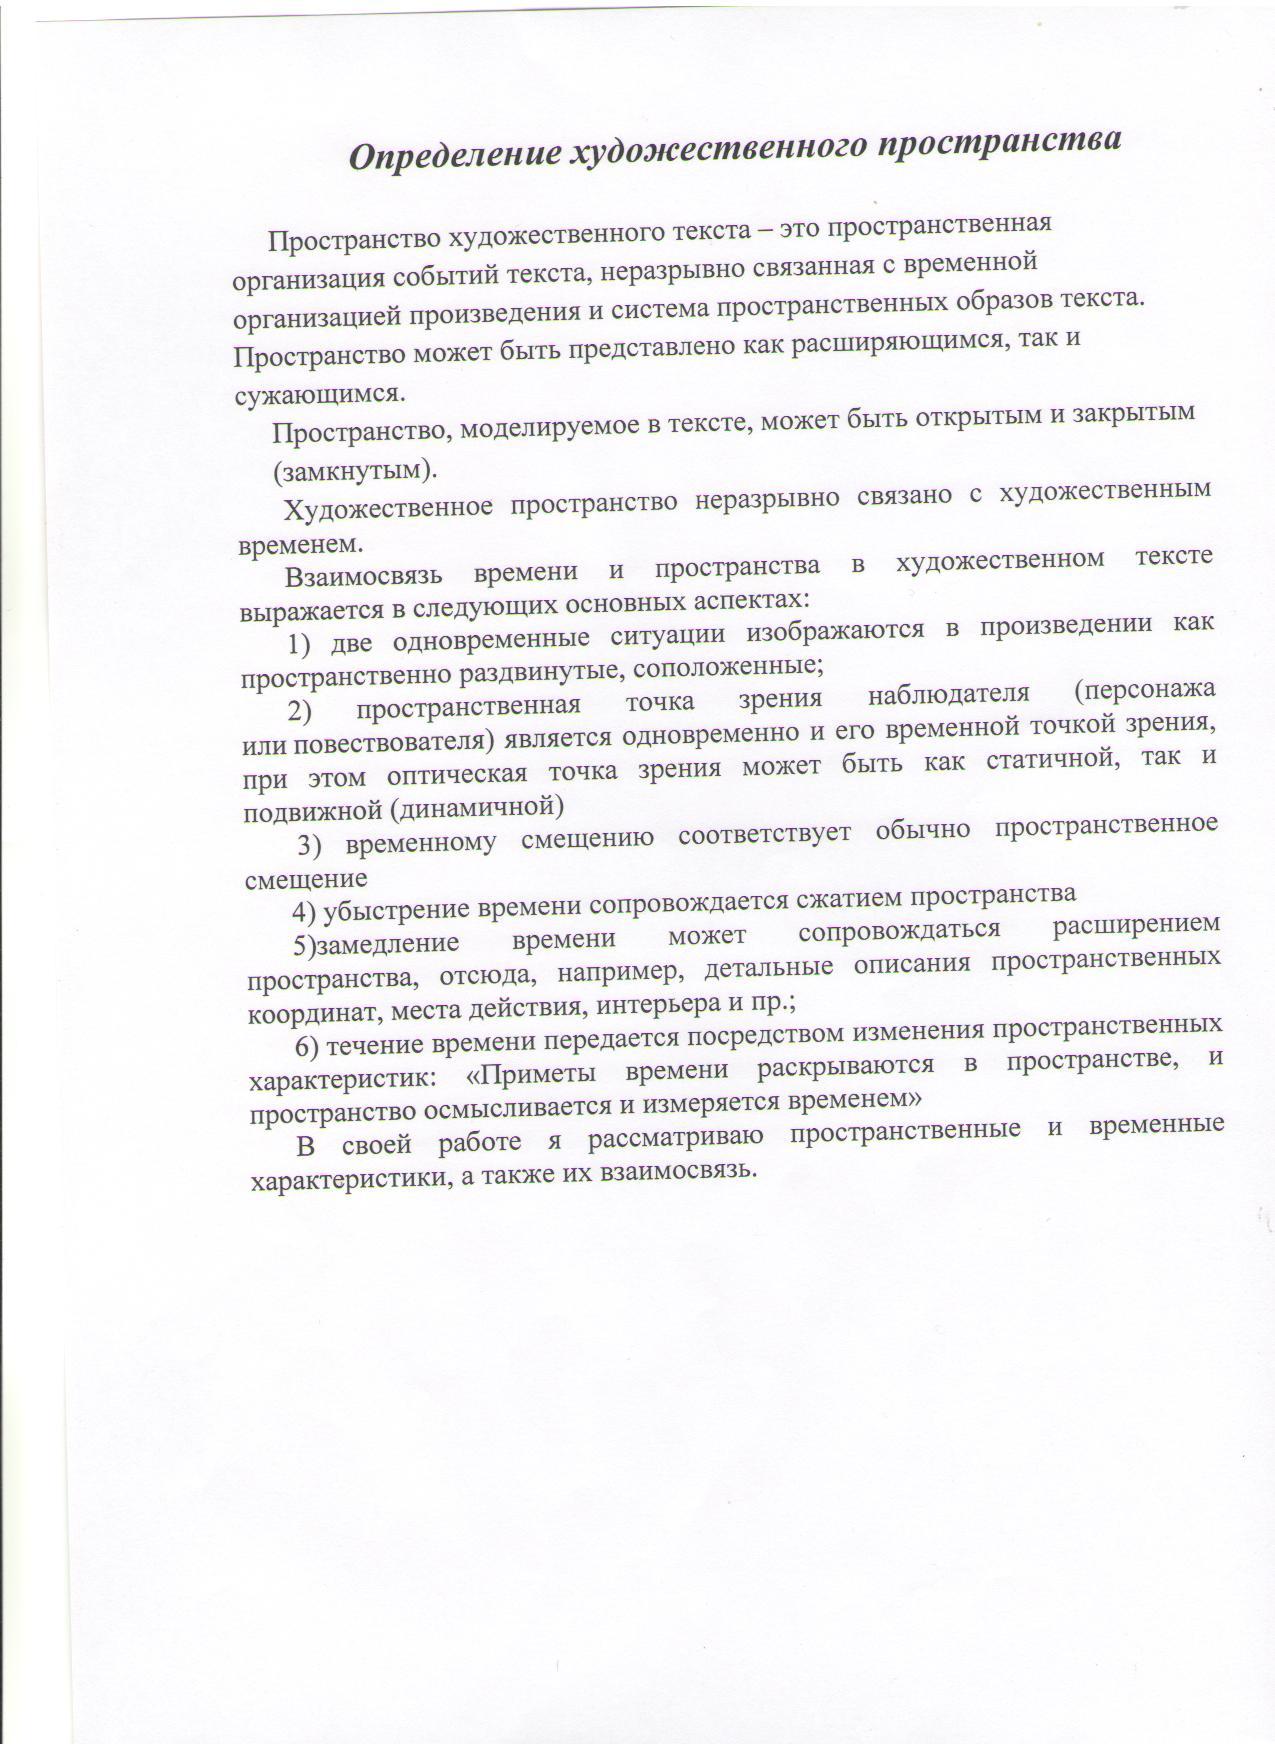 C:\Documents and Settings\Иван\Рабочий стол\gtlcjdtn\изображение 003.jpg